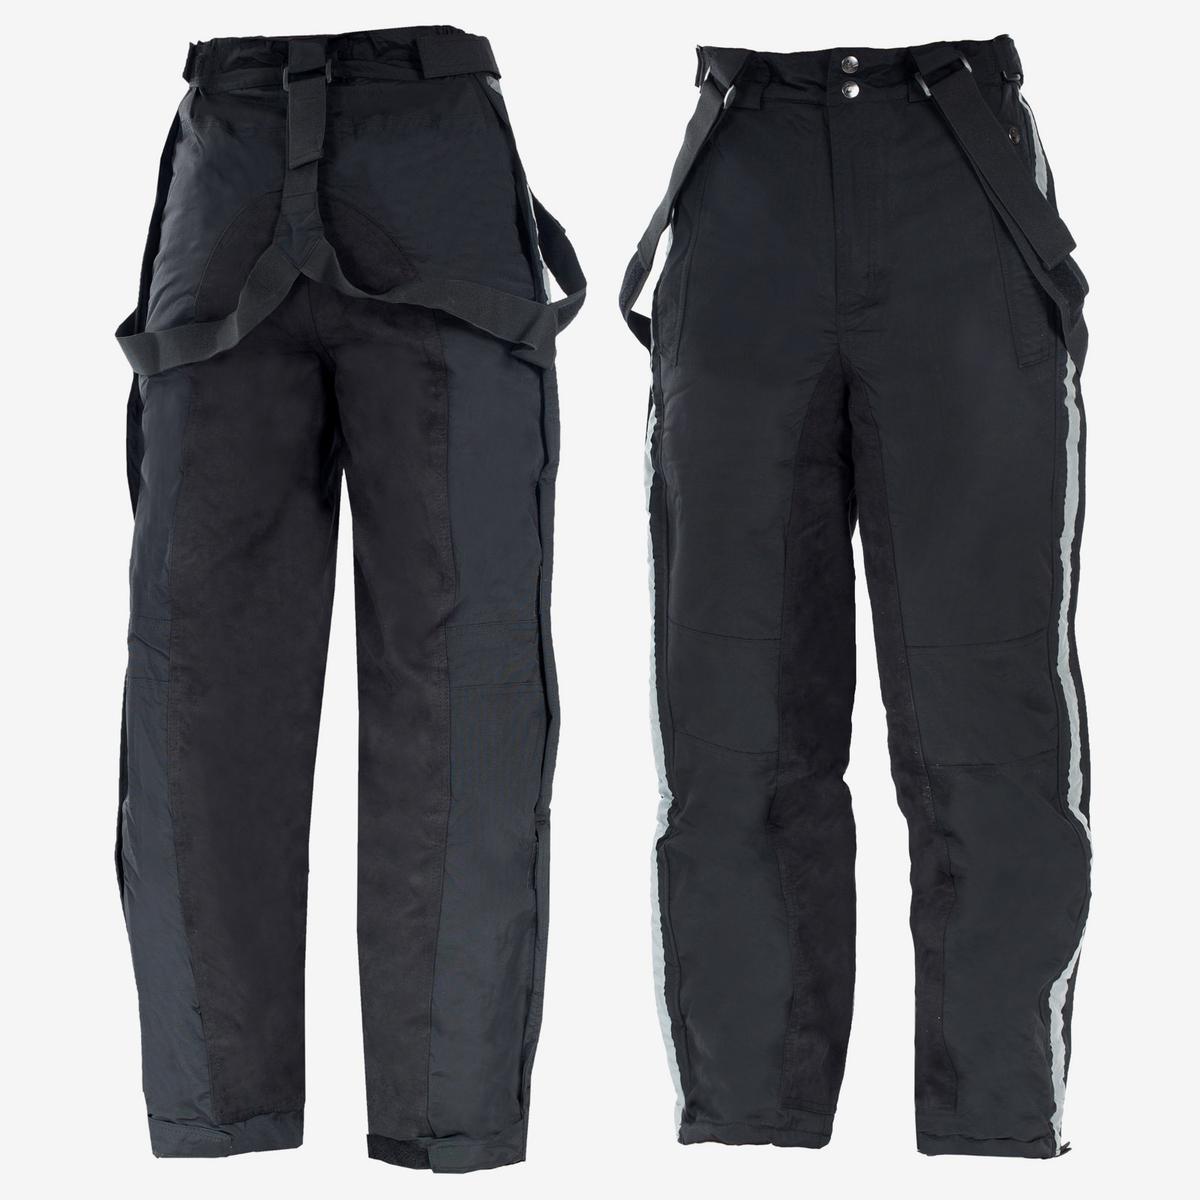 78c08df355c Horze Winter Rider Trousers | Horze